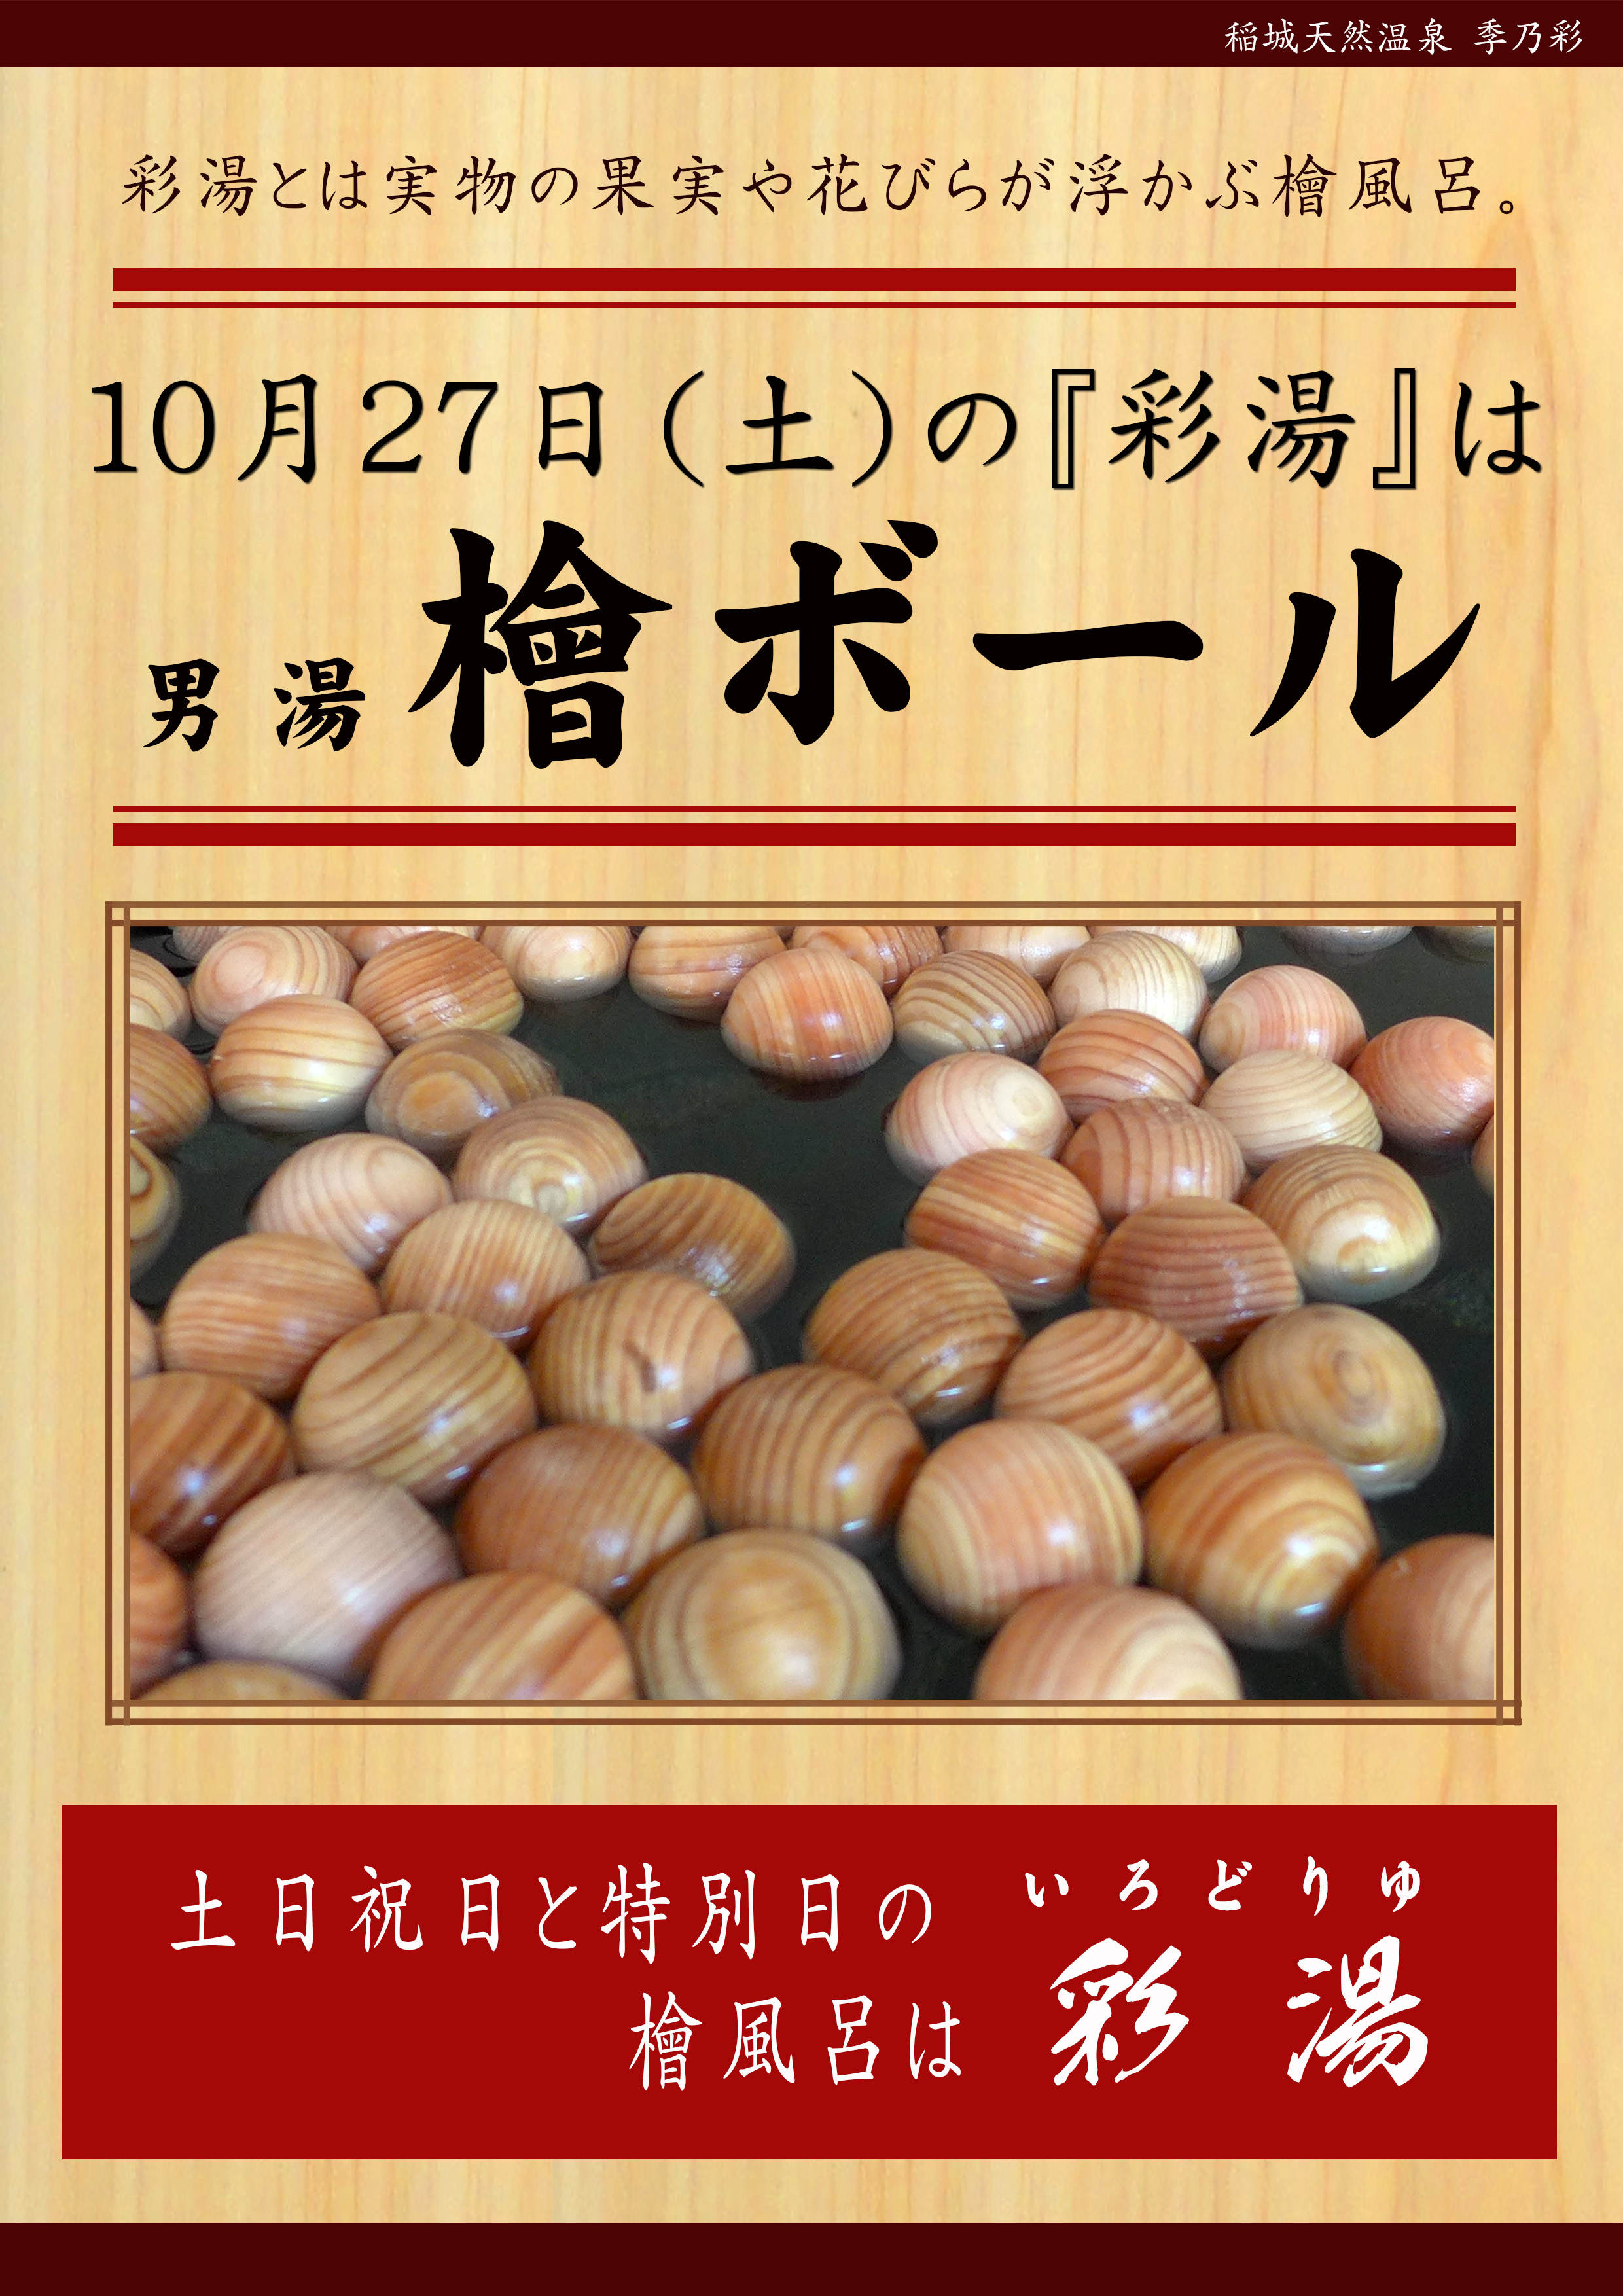 20181027POP イベント 彩湯 男湯 檜ボール